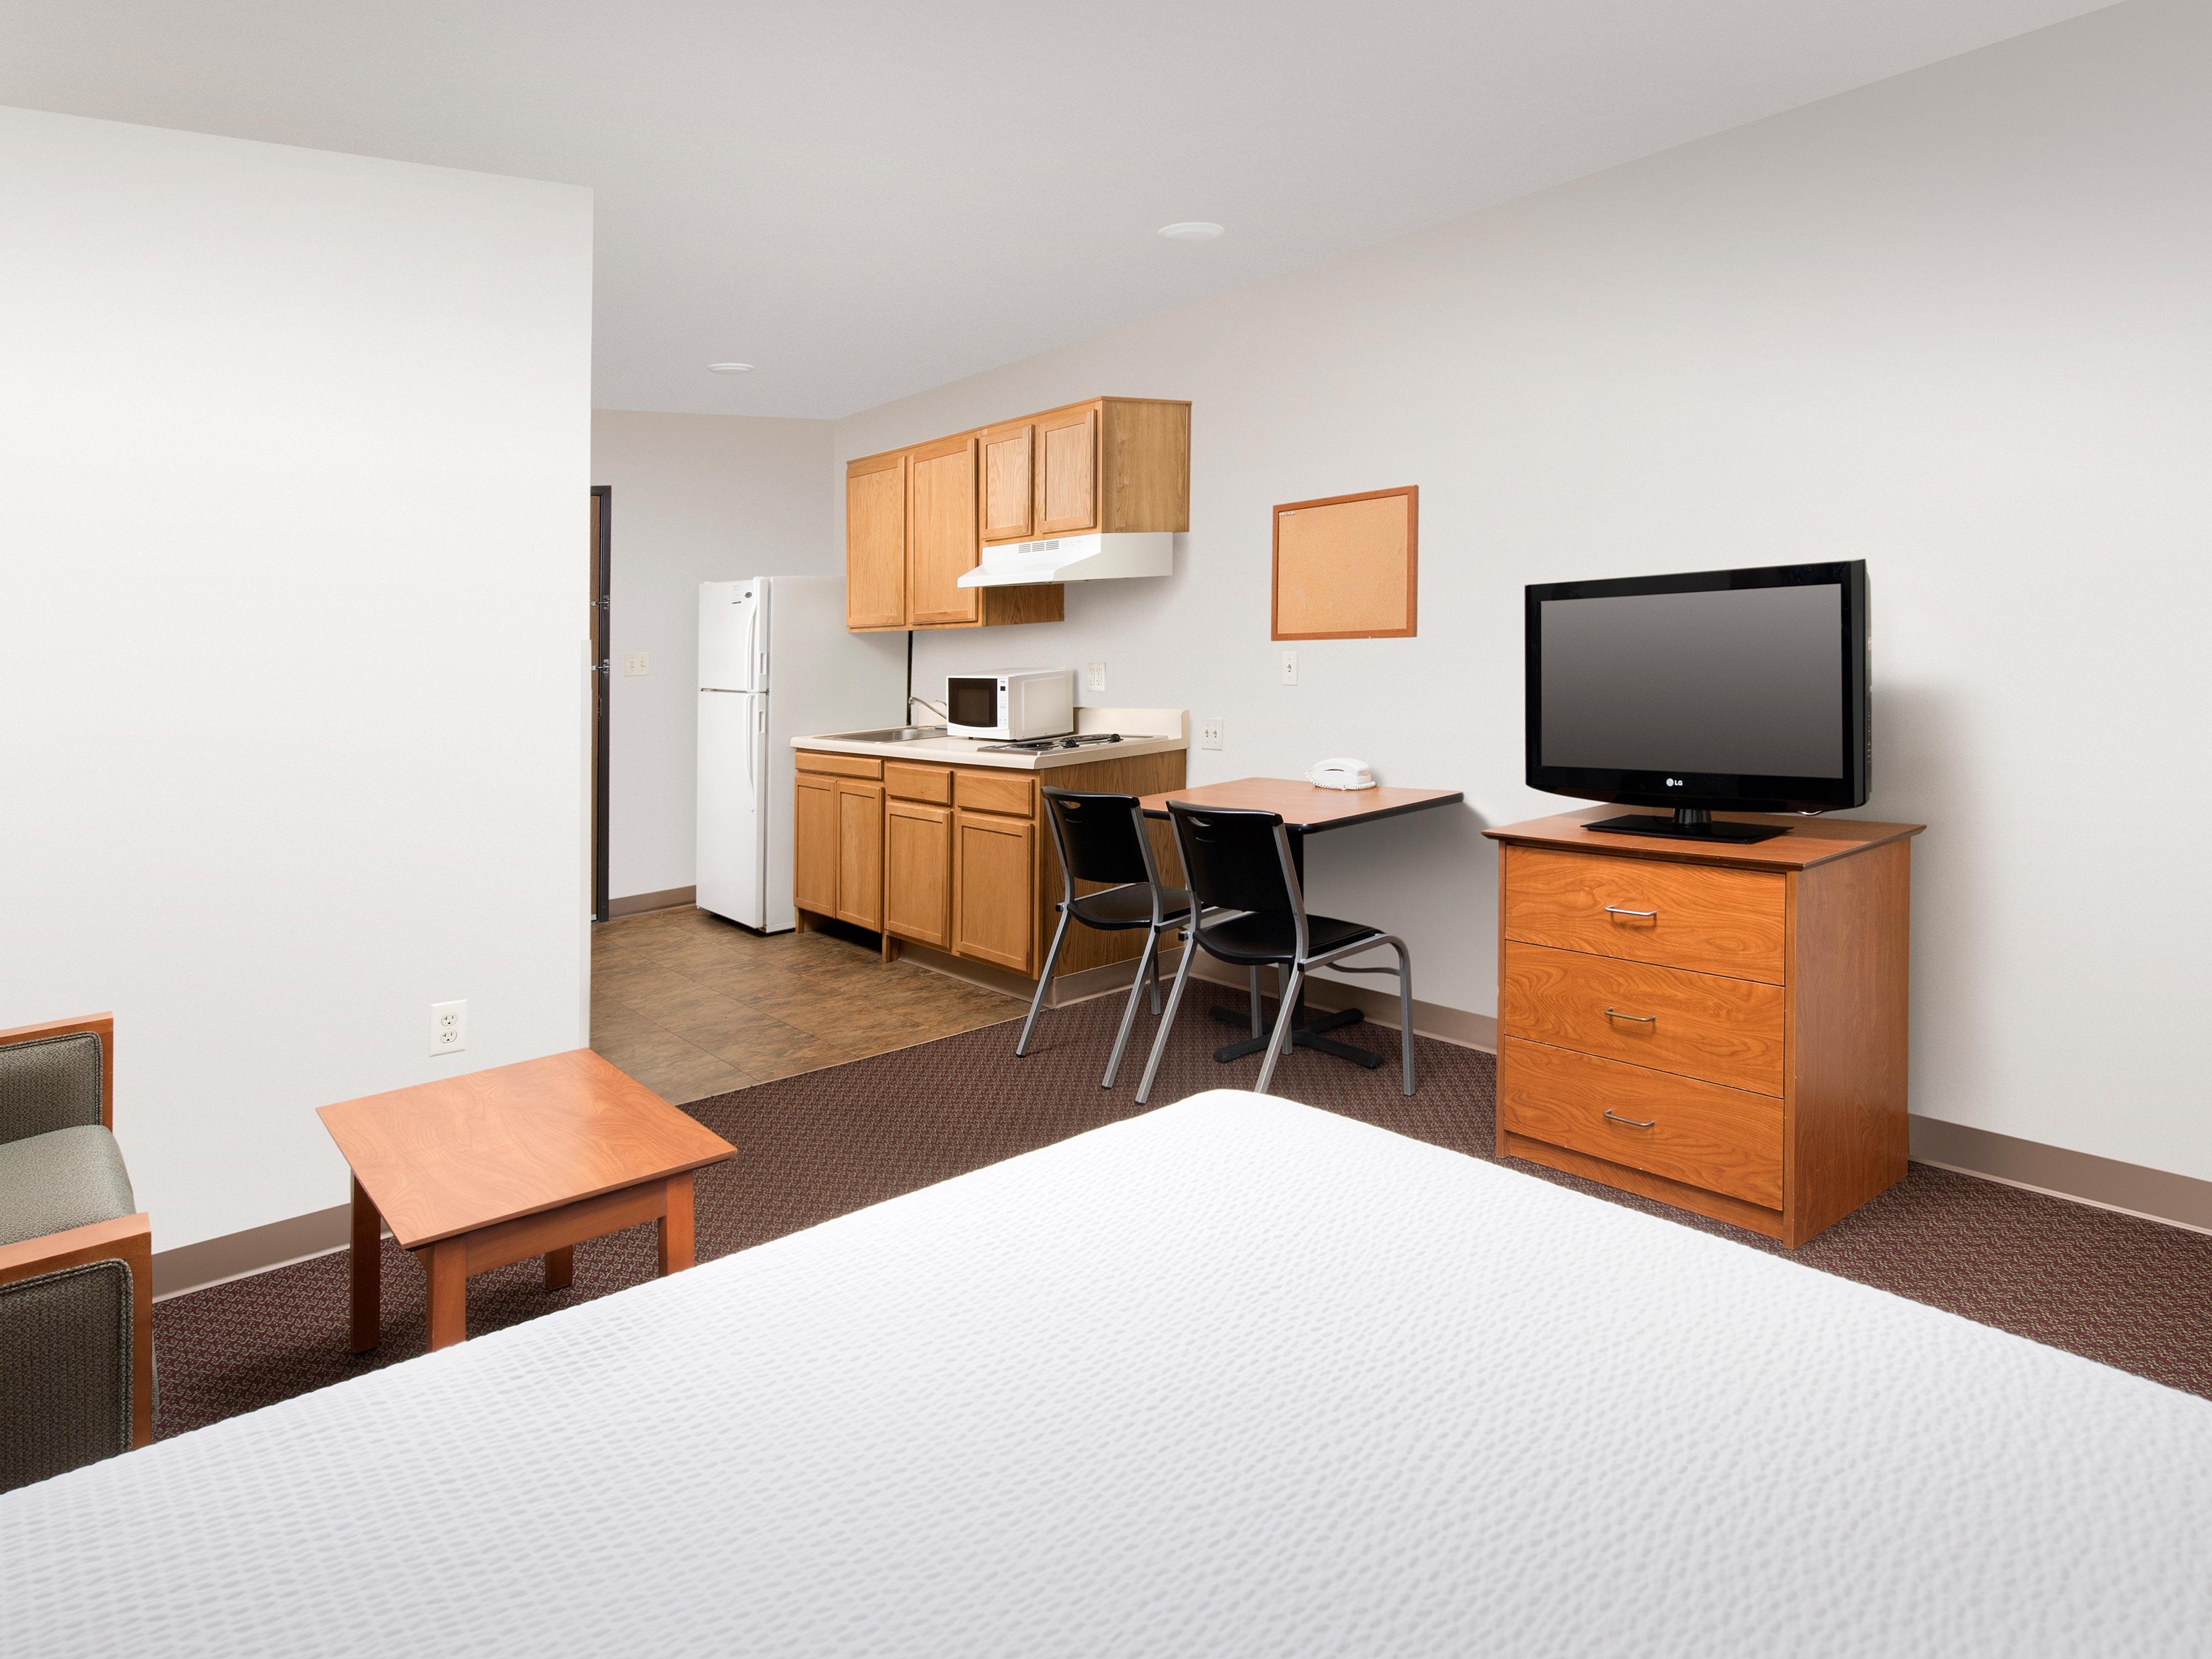 WoodSpring Suites Pensacola Northeast image 22